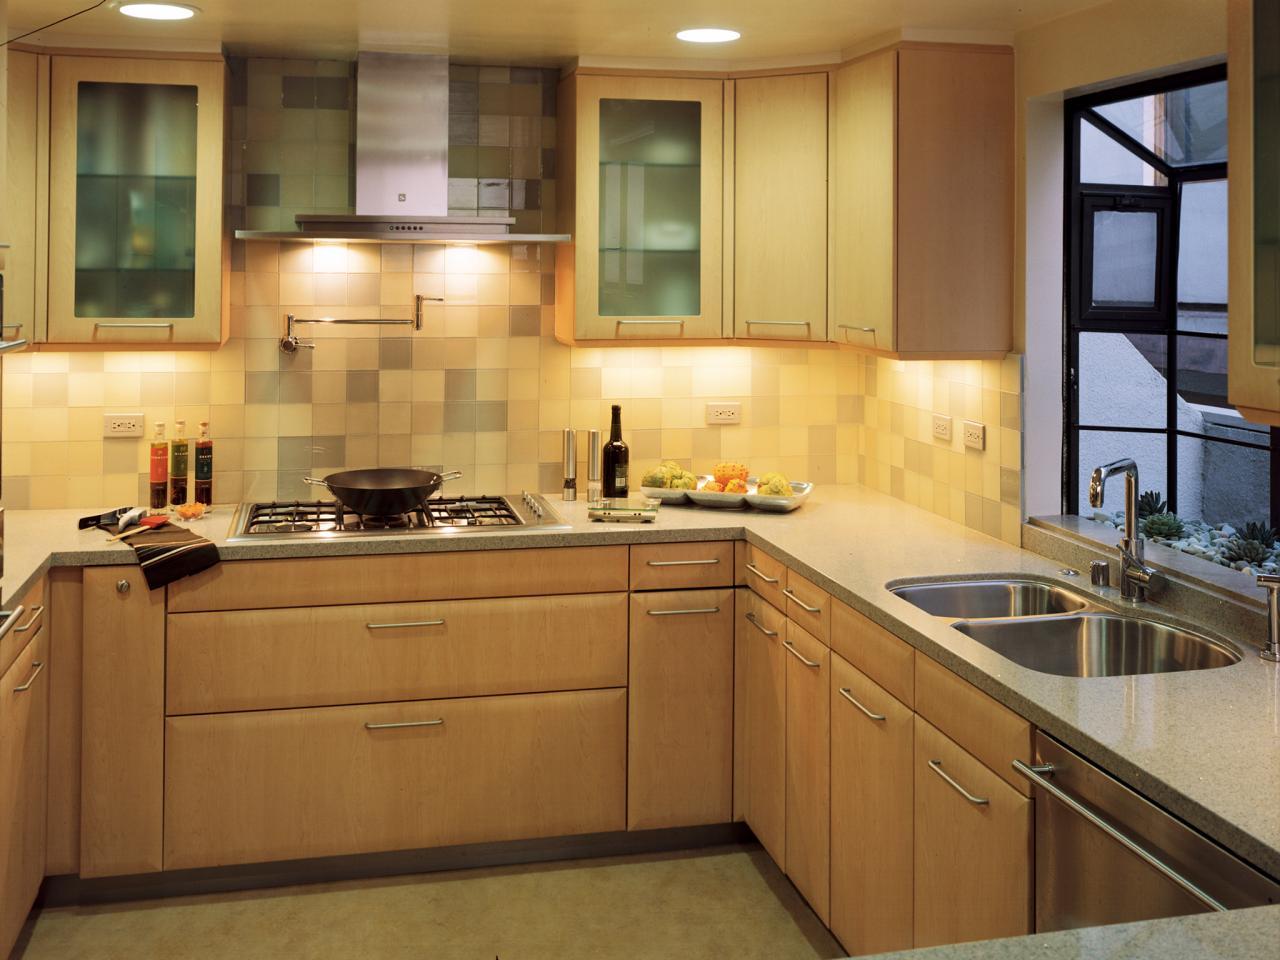 kitchen cabinets design cottage style cabinets JMVIYYB